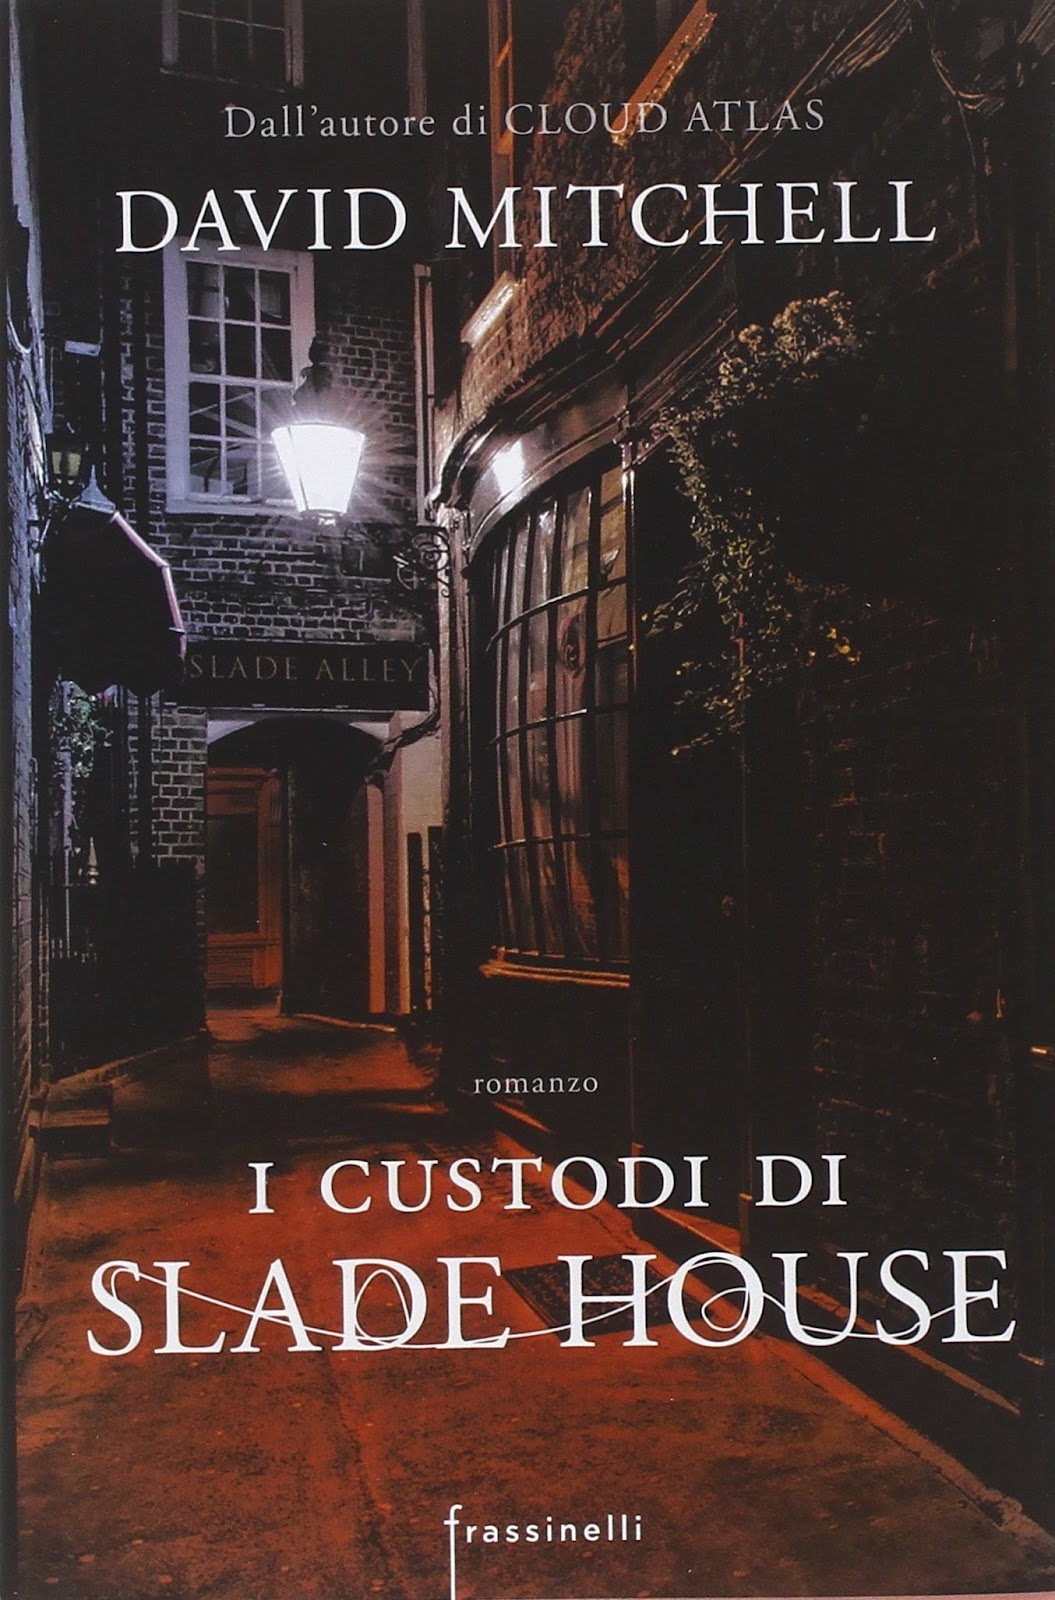 I custodi di Slade House David Mitchell Frassinelli fantasy horror